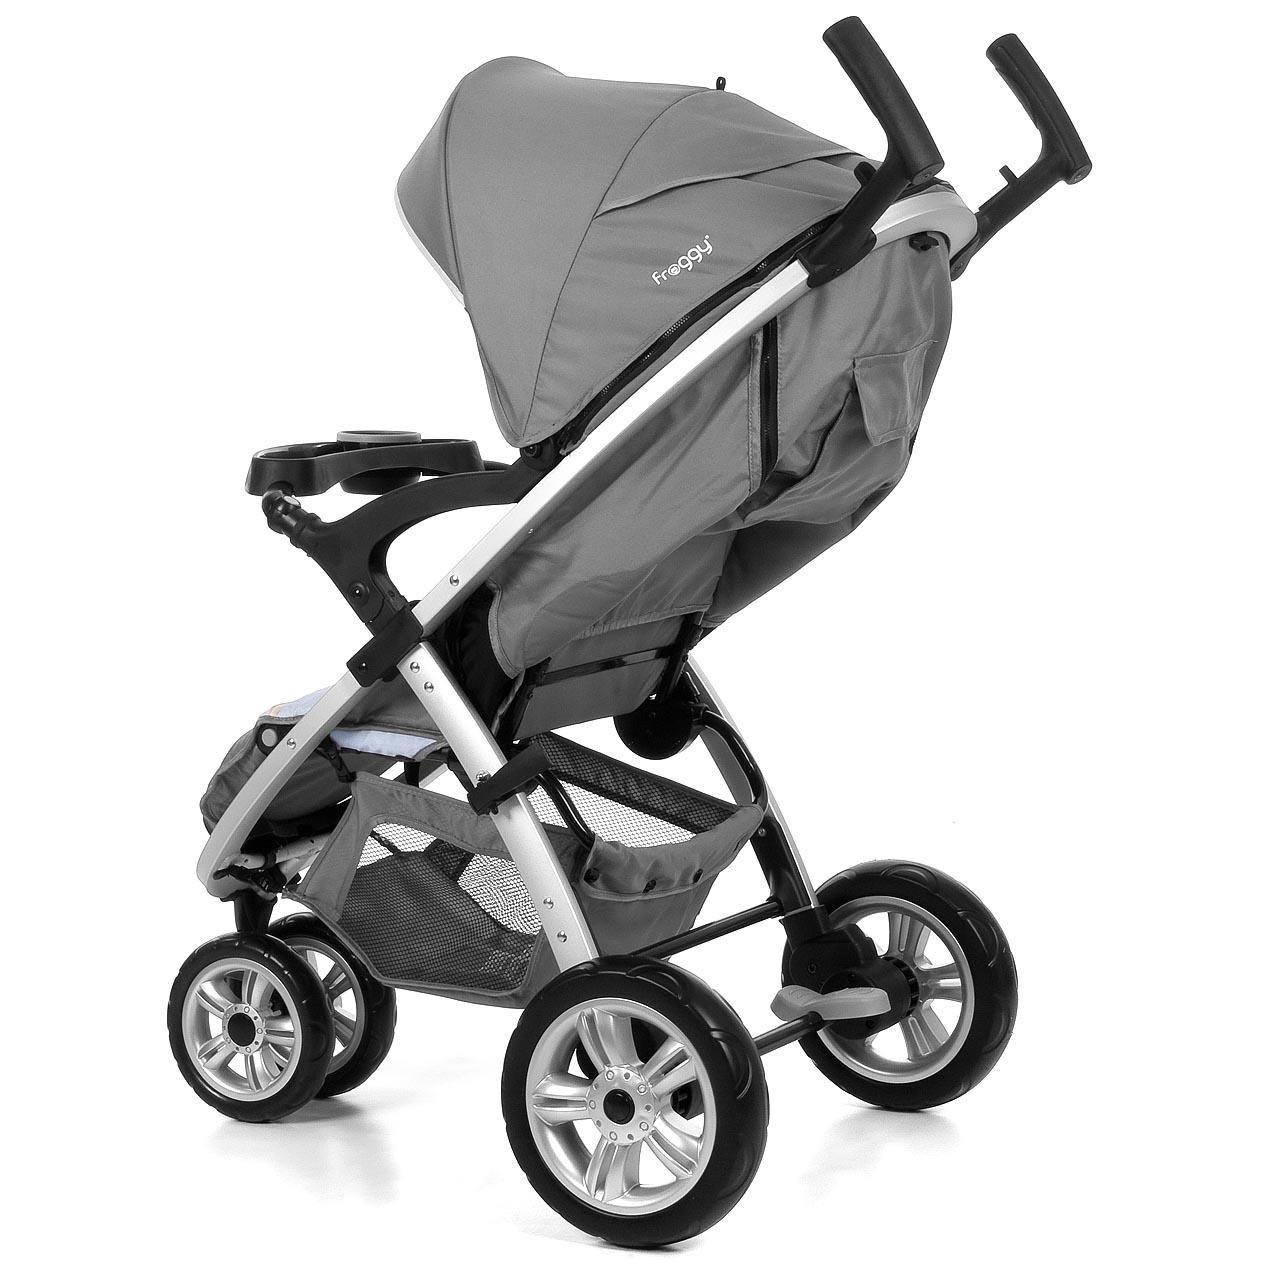 Froggy® Citybug cochecito de niño con errores cielo silla de paseo de empuje: Amazon.es: Bebé